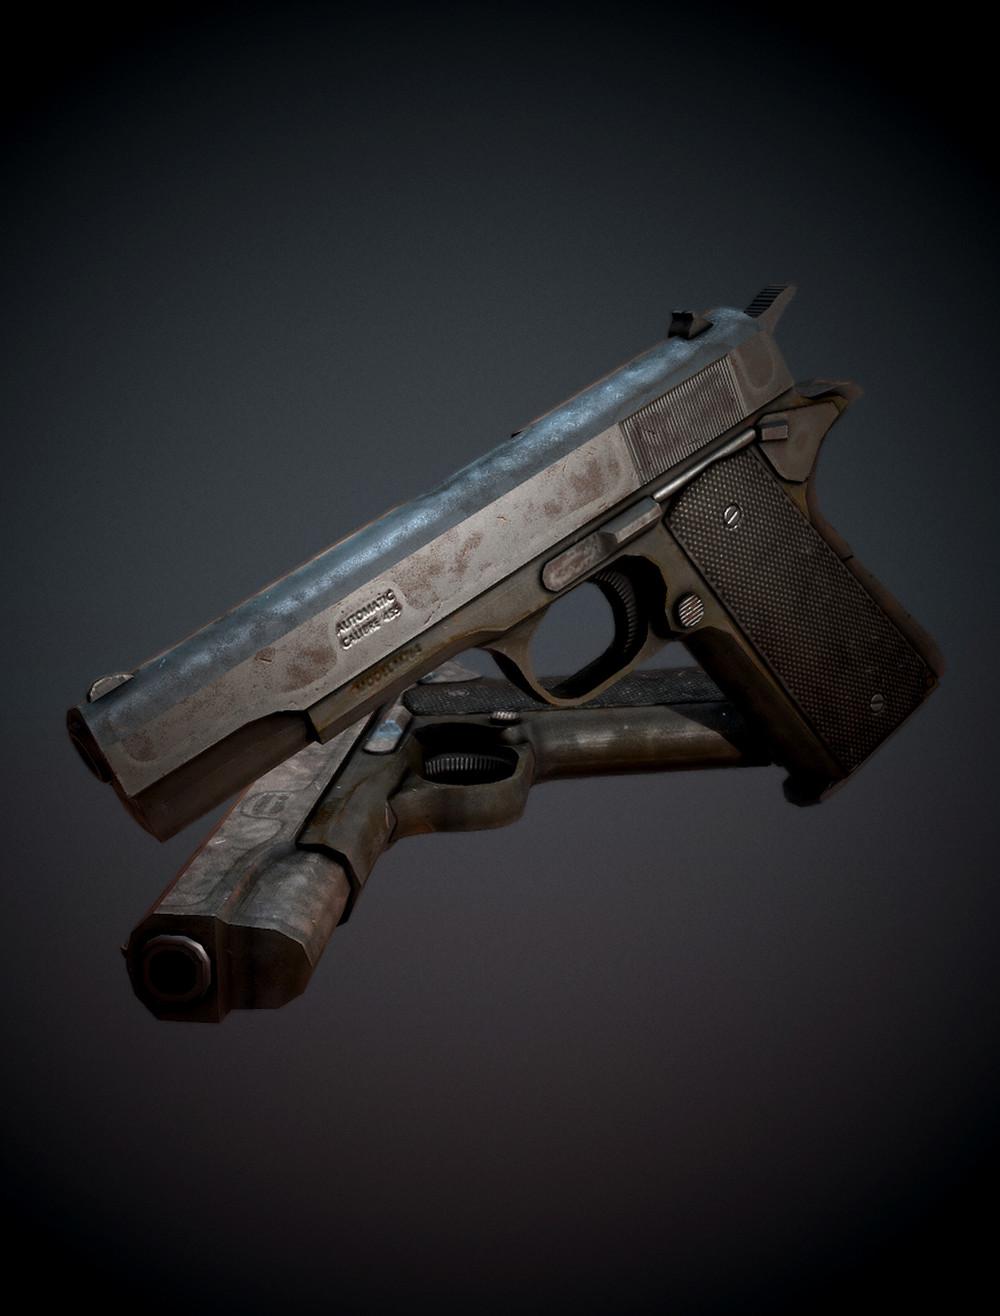 Zpocalypse - 1911 Pistol